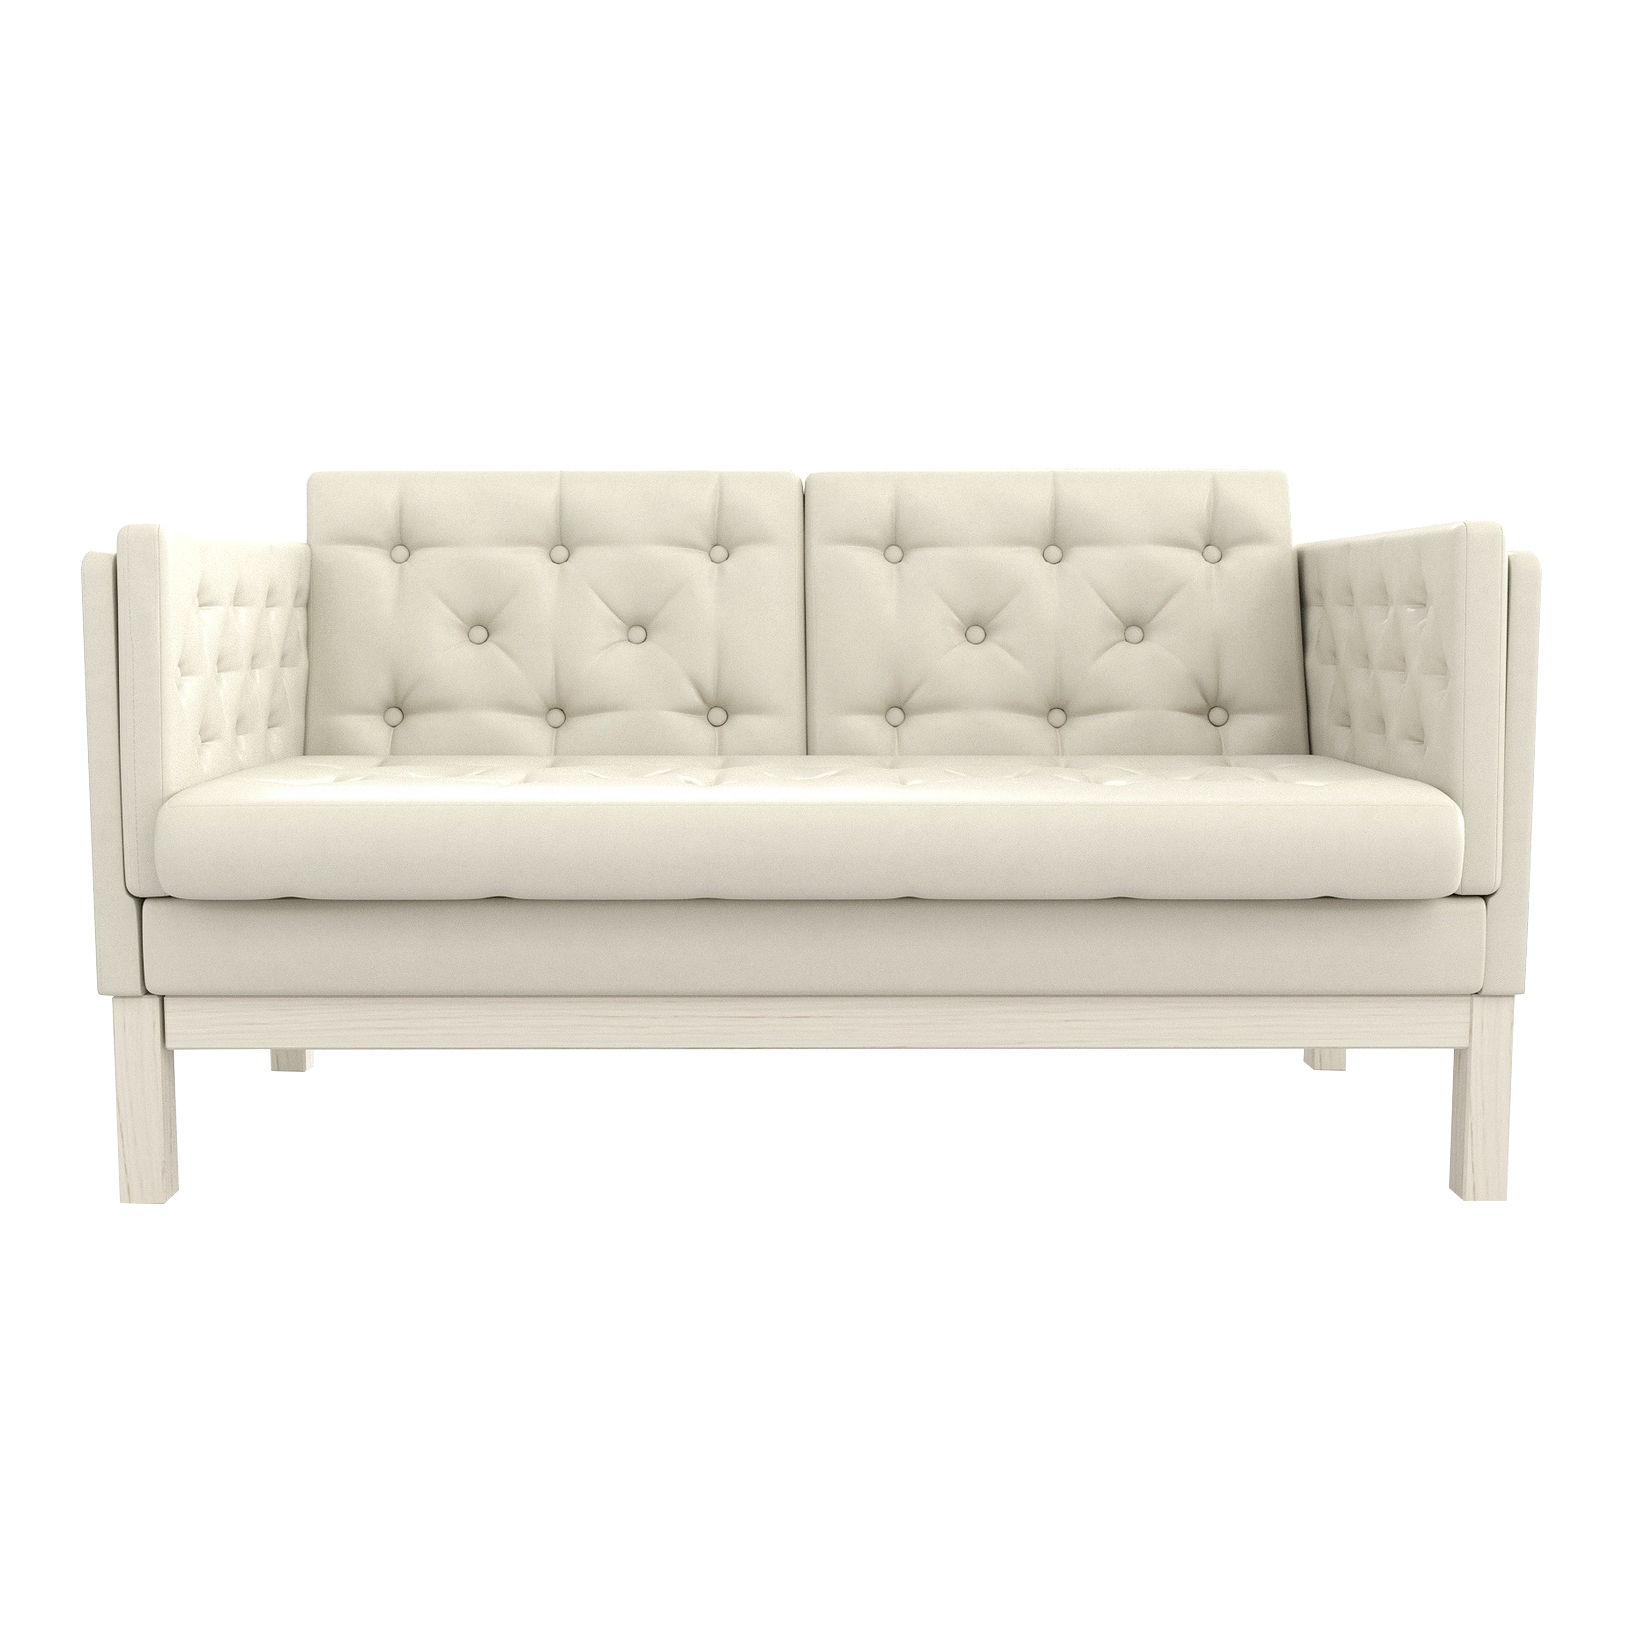 Фото - Диван AS Алана м 154x82x83 беленый дуб/белый диван as алана м 154x82x83 сосна коричневый